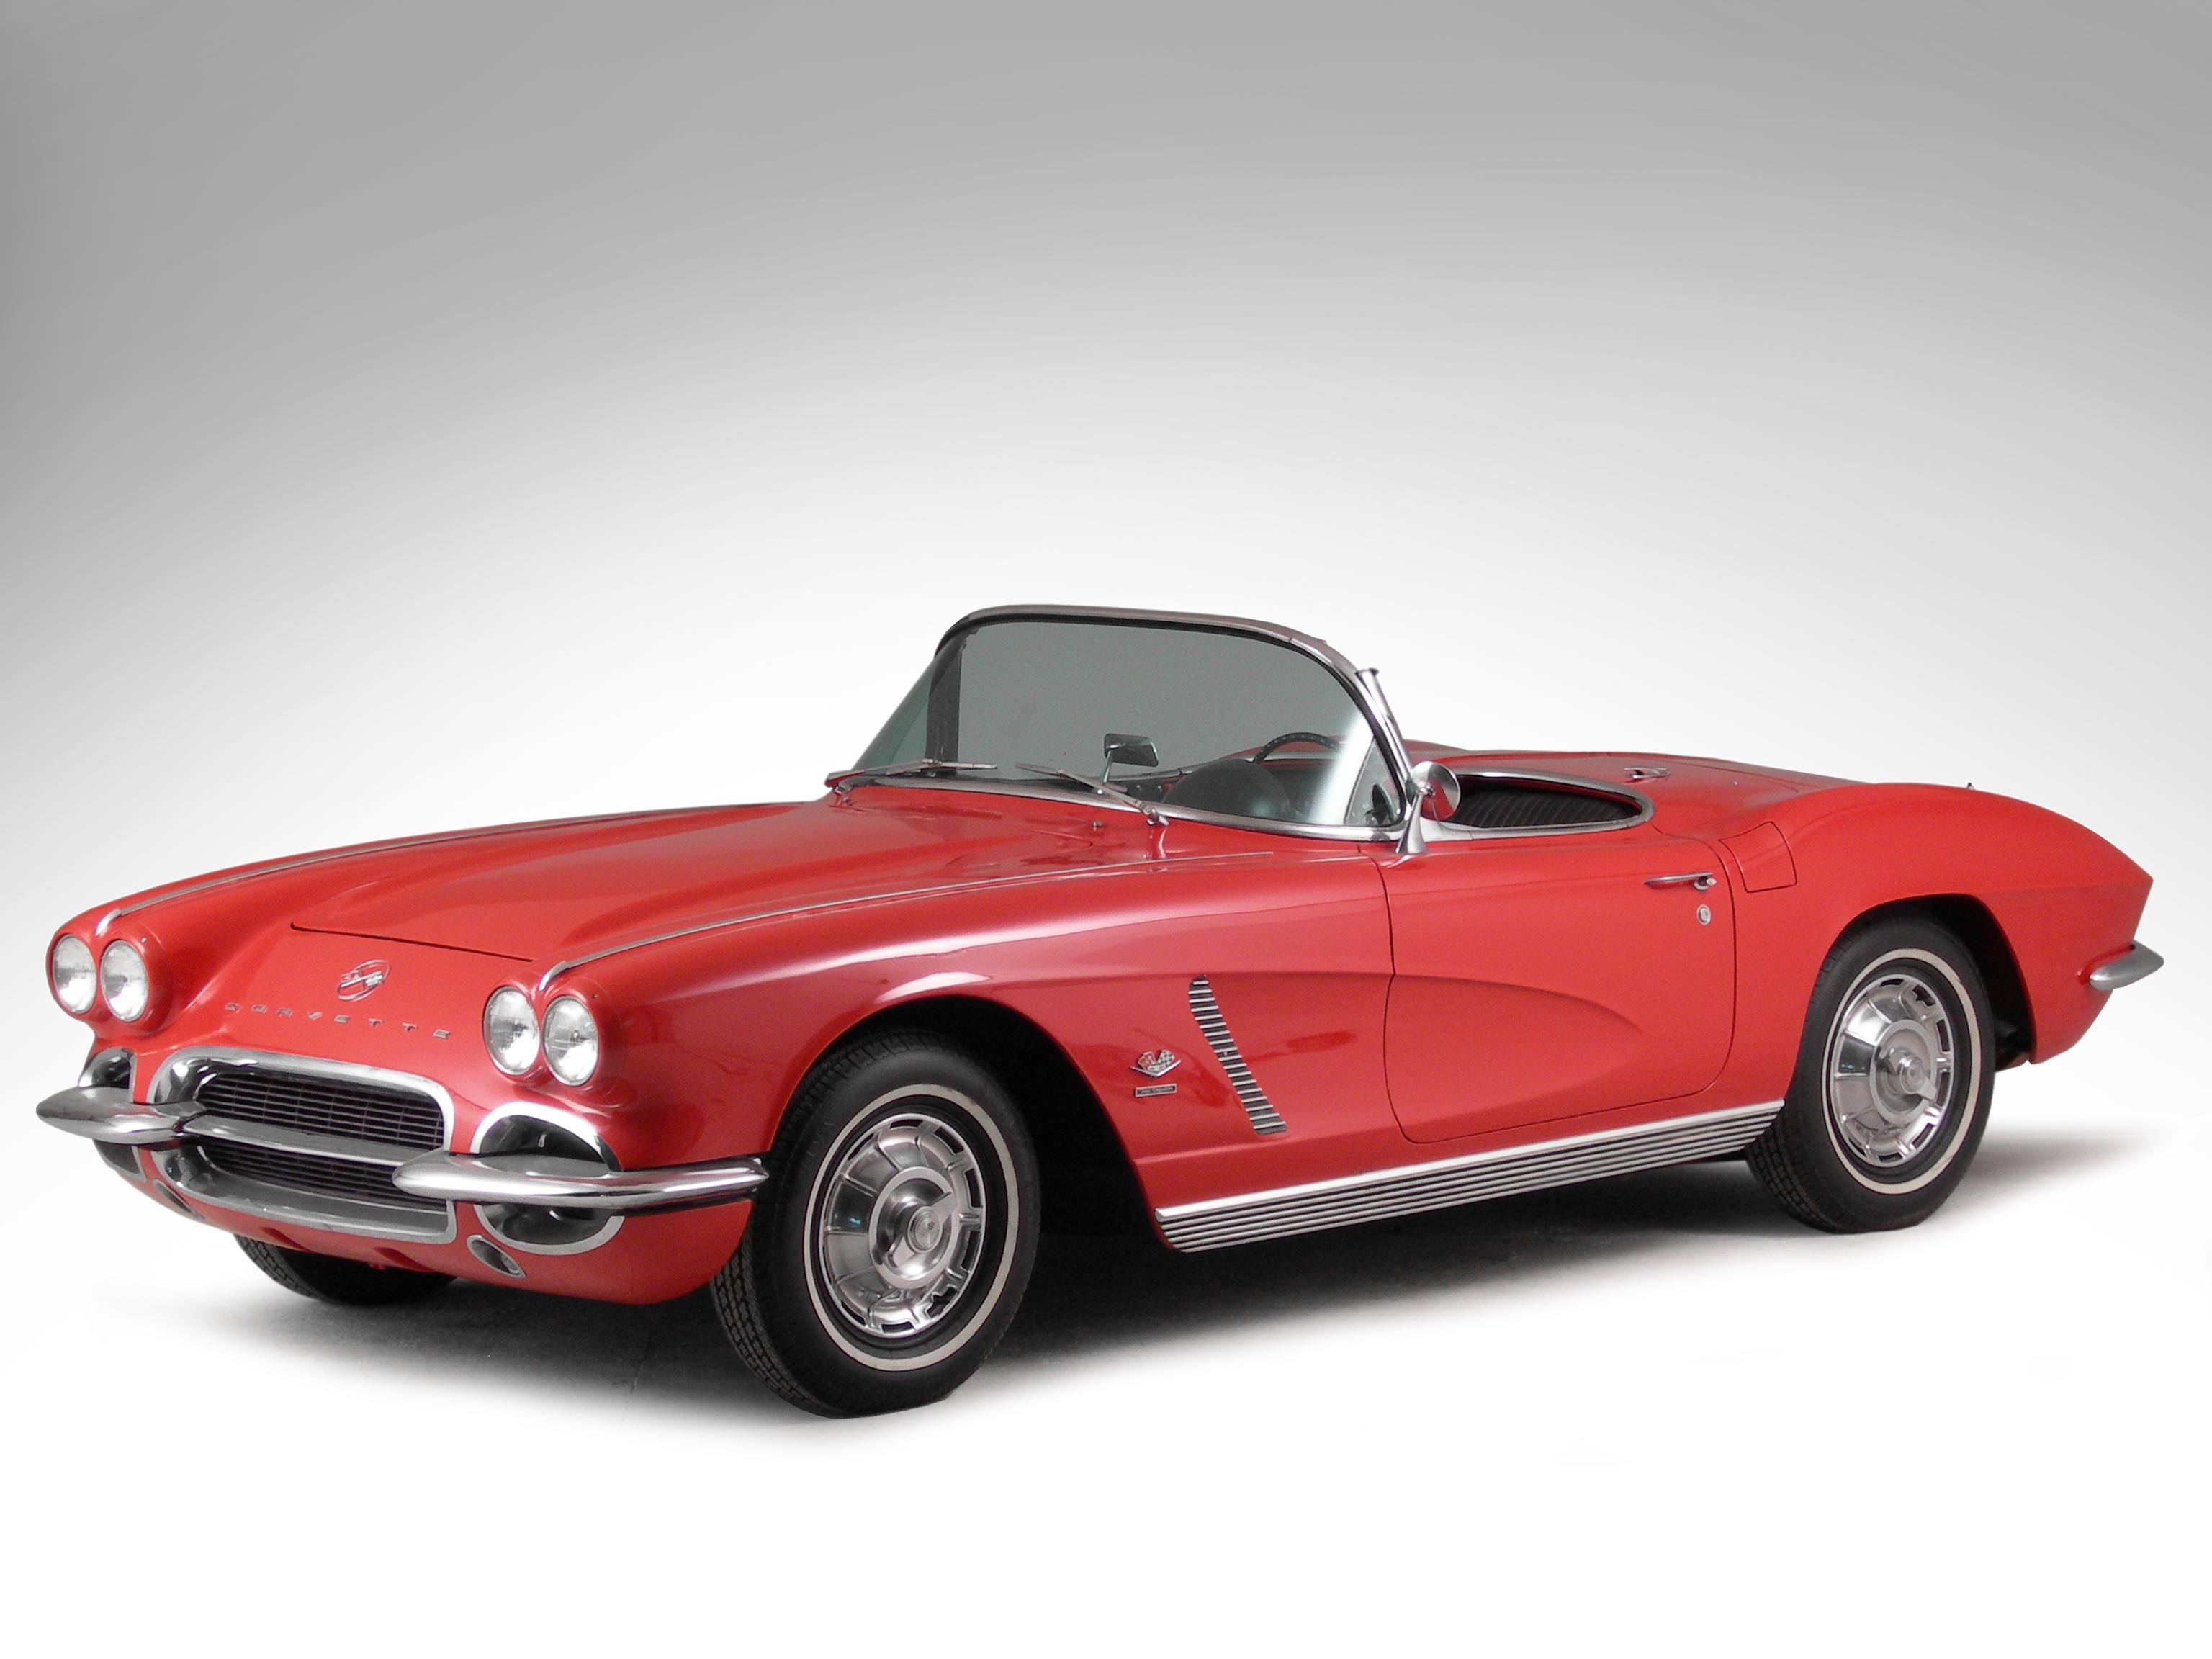 1962 Chevrolet Corvette Roadster Chassis no. 208 67S 105338